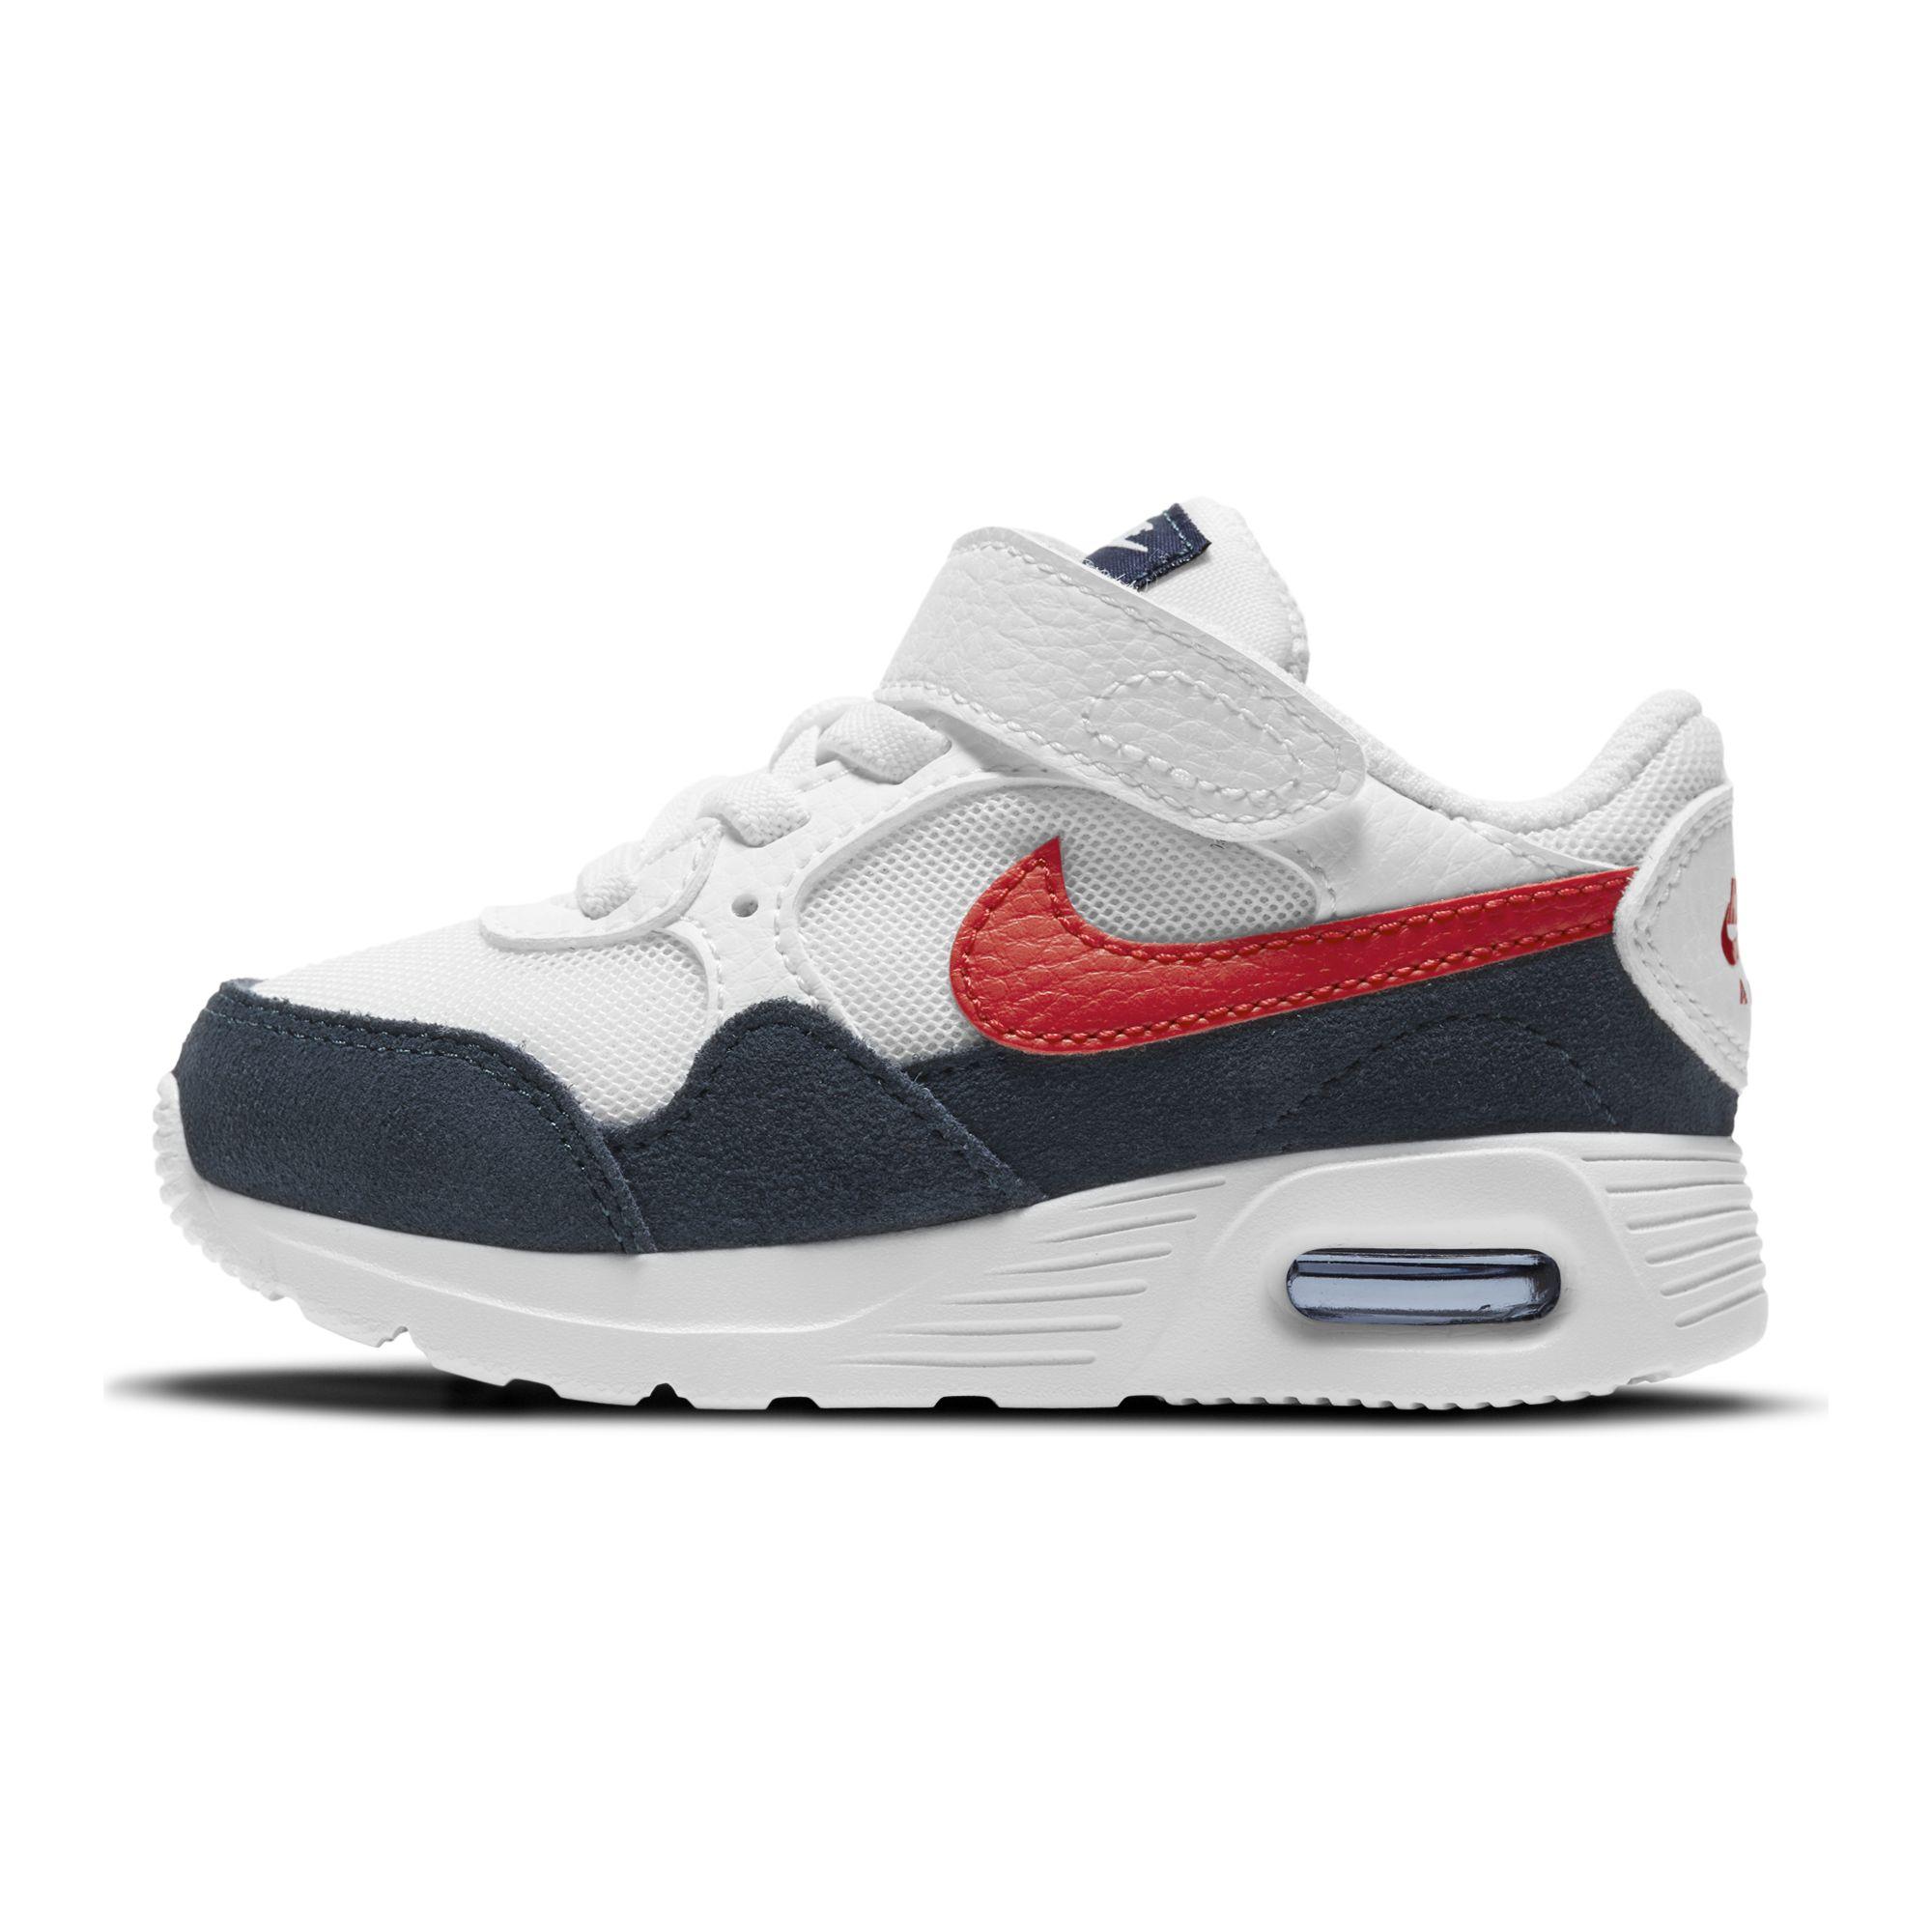 Air Max enfant Nike CZ5361 103